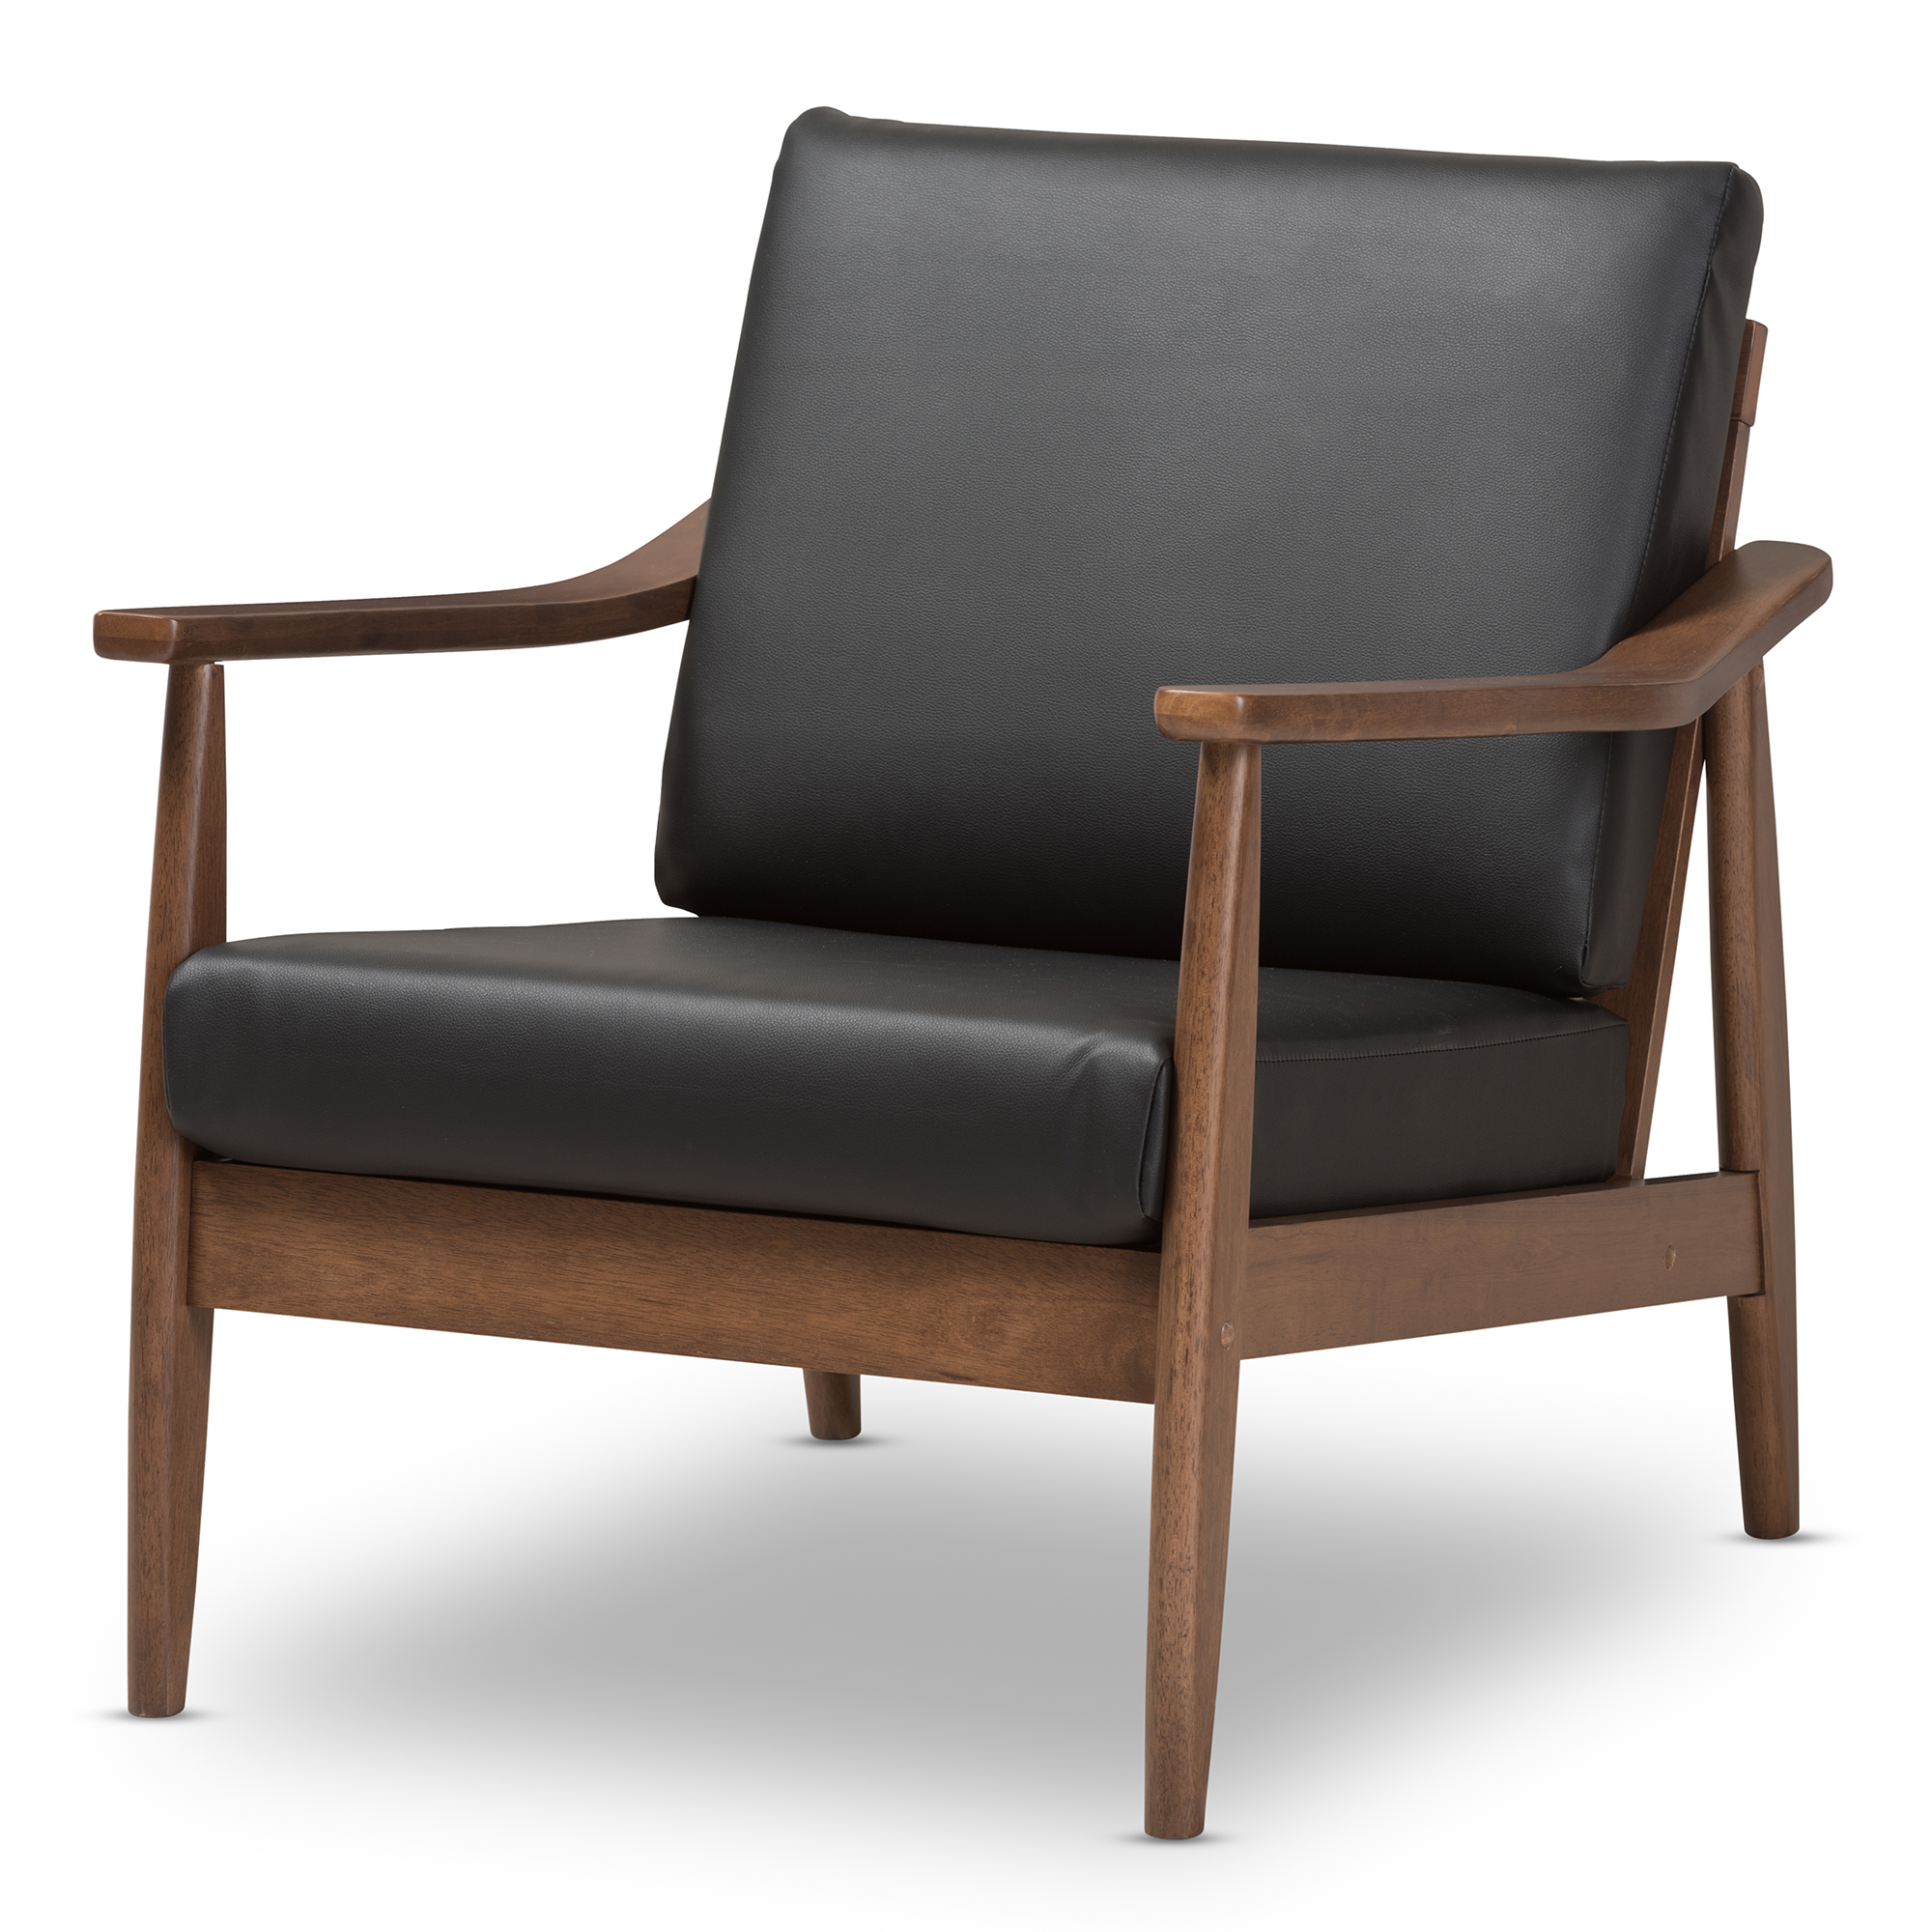 Superior Baxton Studio Venza Mid Century Modern Walnut Wood Black Faux Leather  Lounge Chair